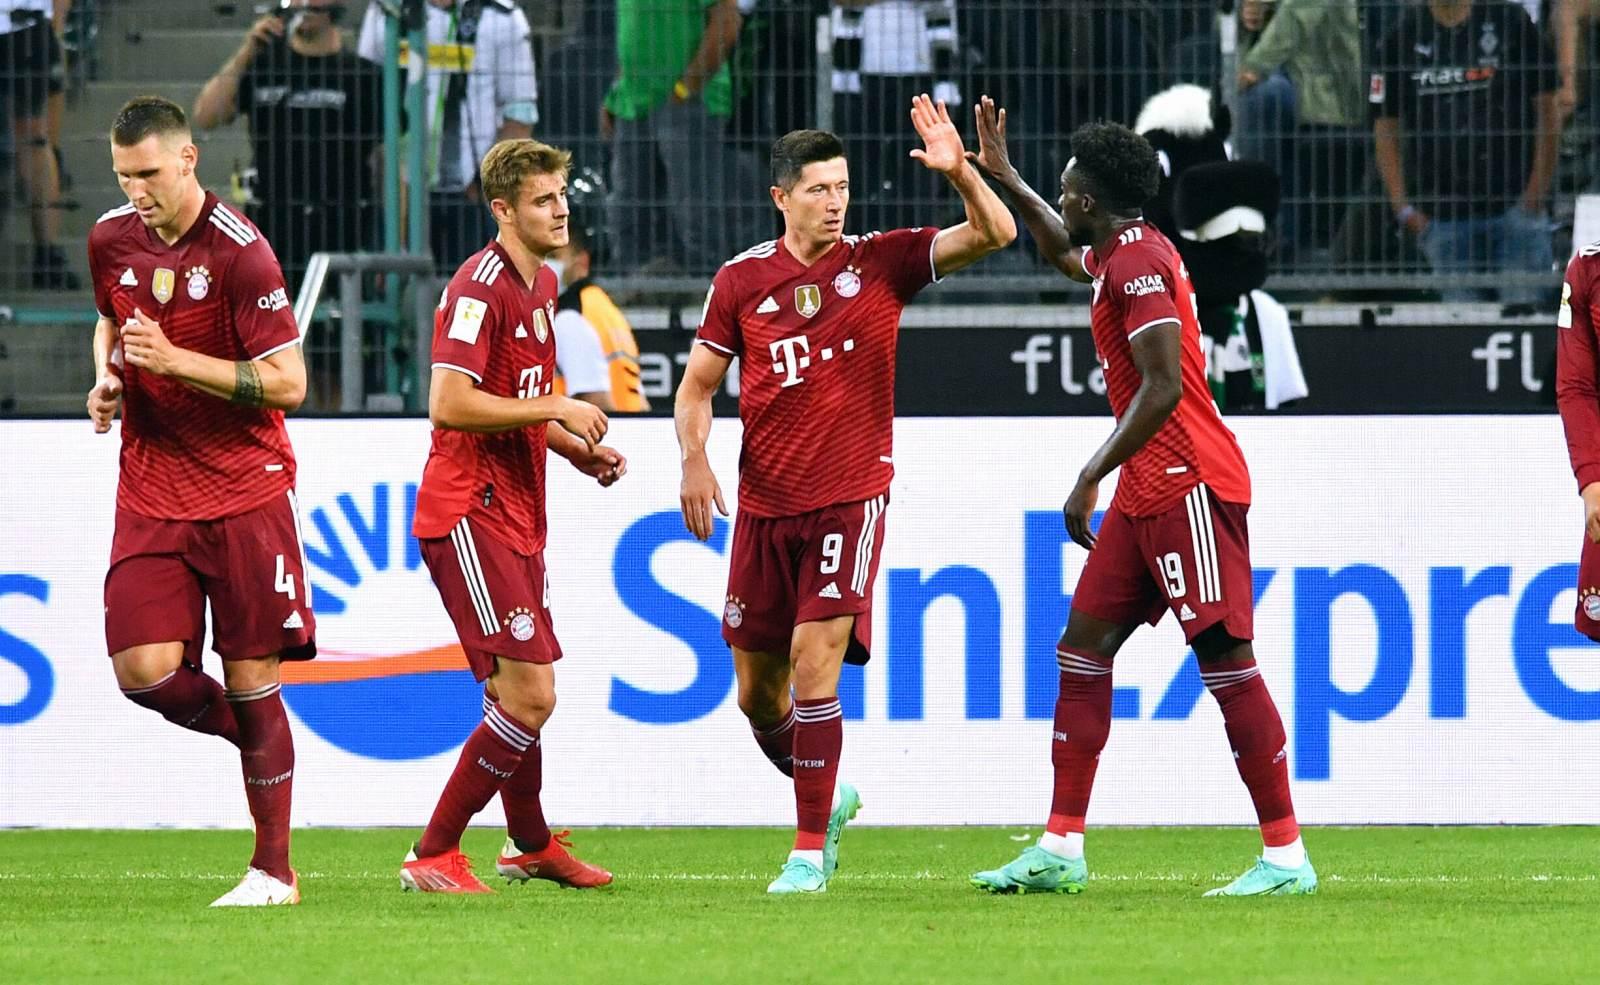 «Гройтер Фюрт» - «Бавария»: прогноз и ставка на матч чемпионата Германии – 24 сентября 2021